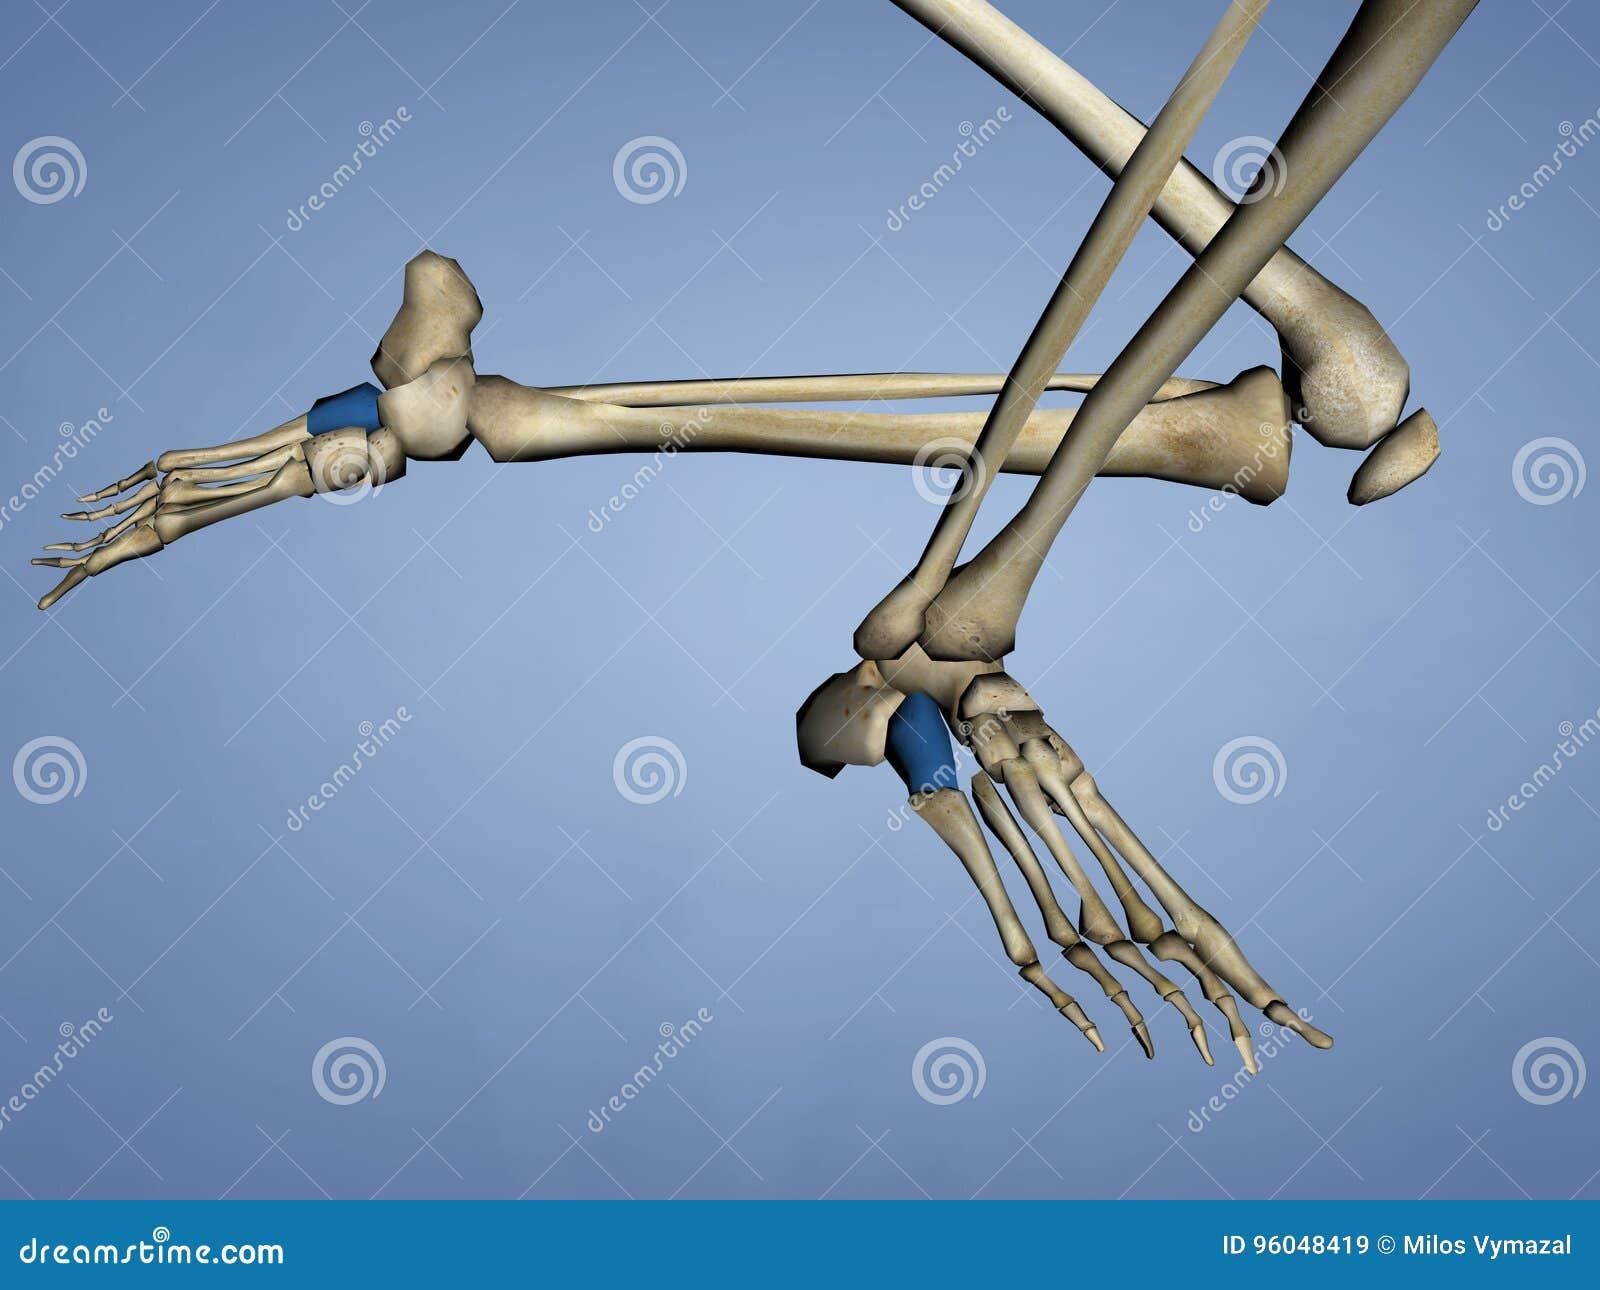 Cuboid Bone, 3D Model stock illustration. Illustration of anatomical ...